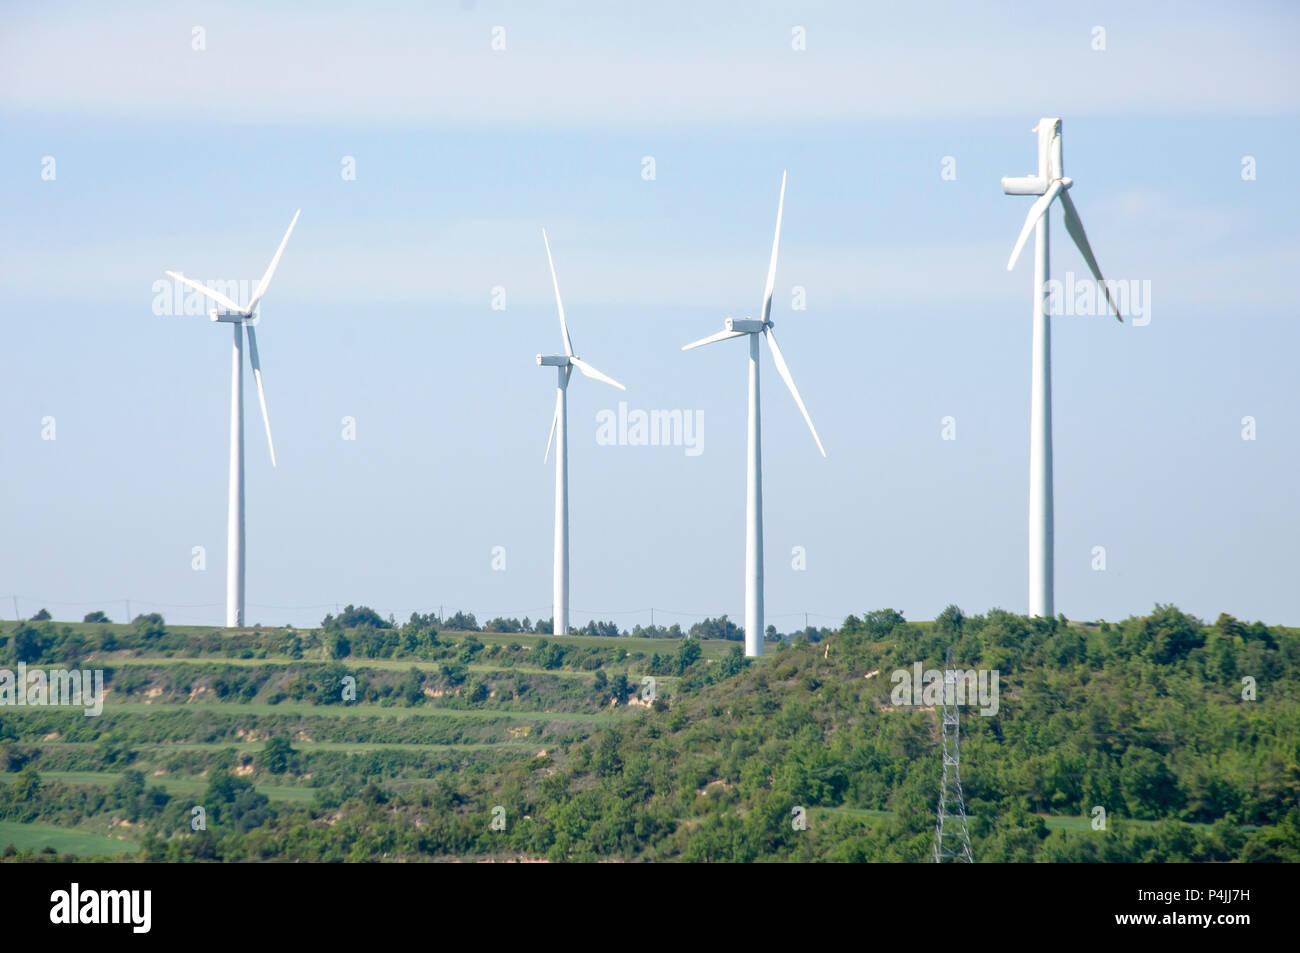 Wind Turbine with Broken Blade; Barcelona, Spain - Stock Image